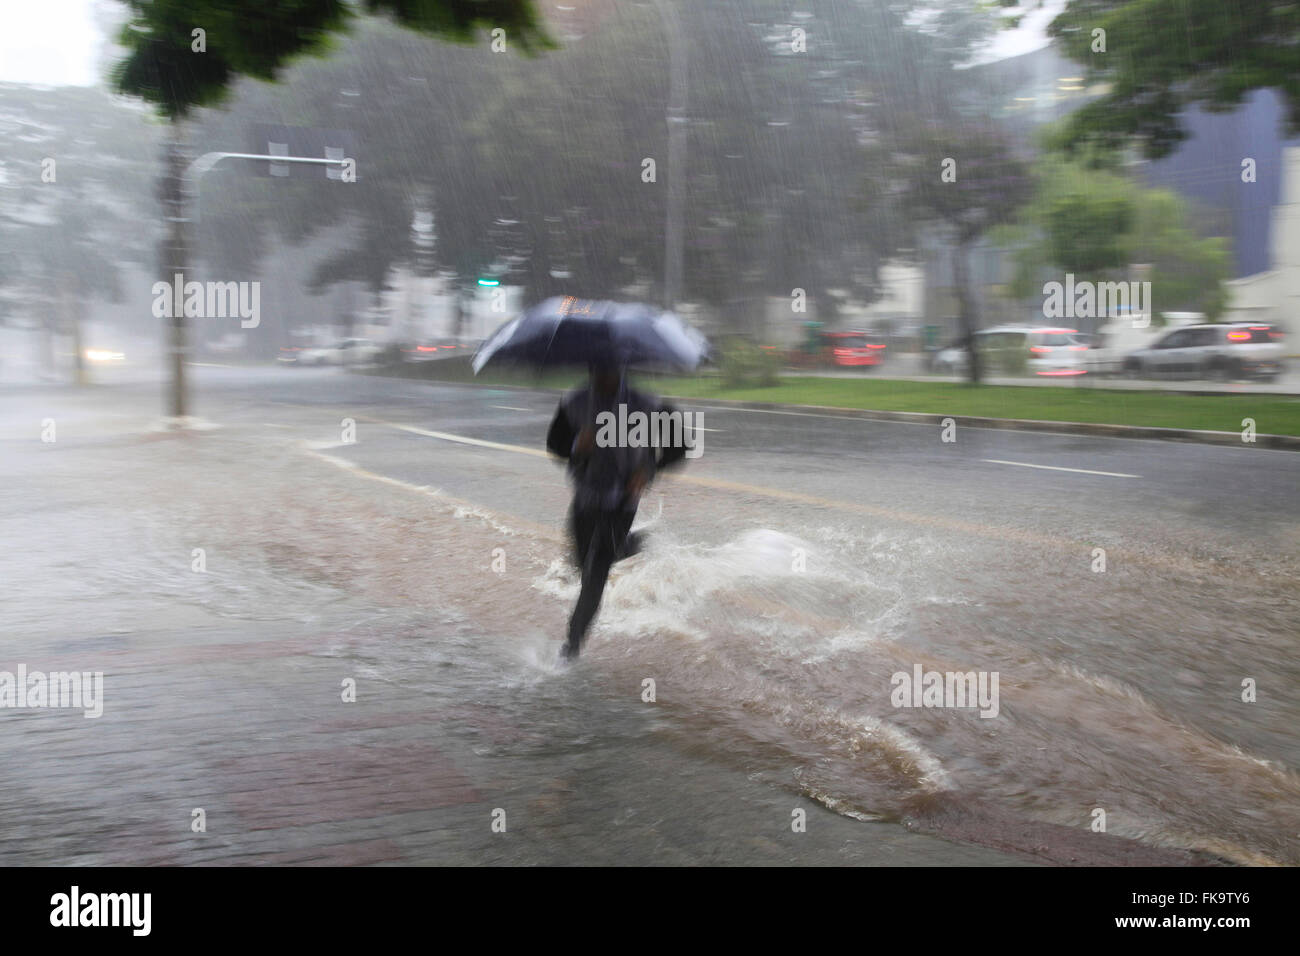 Man jumps resulting stream runoff at Avenida Sumare - Stock Image